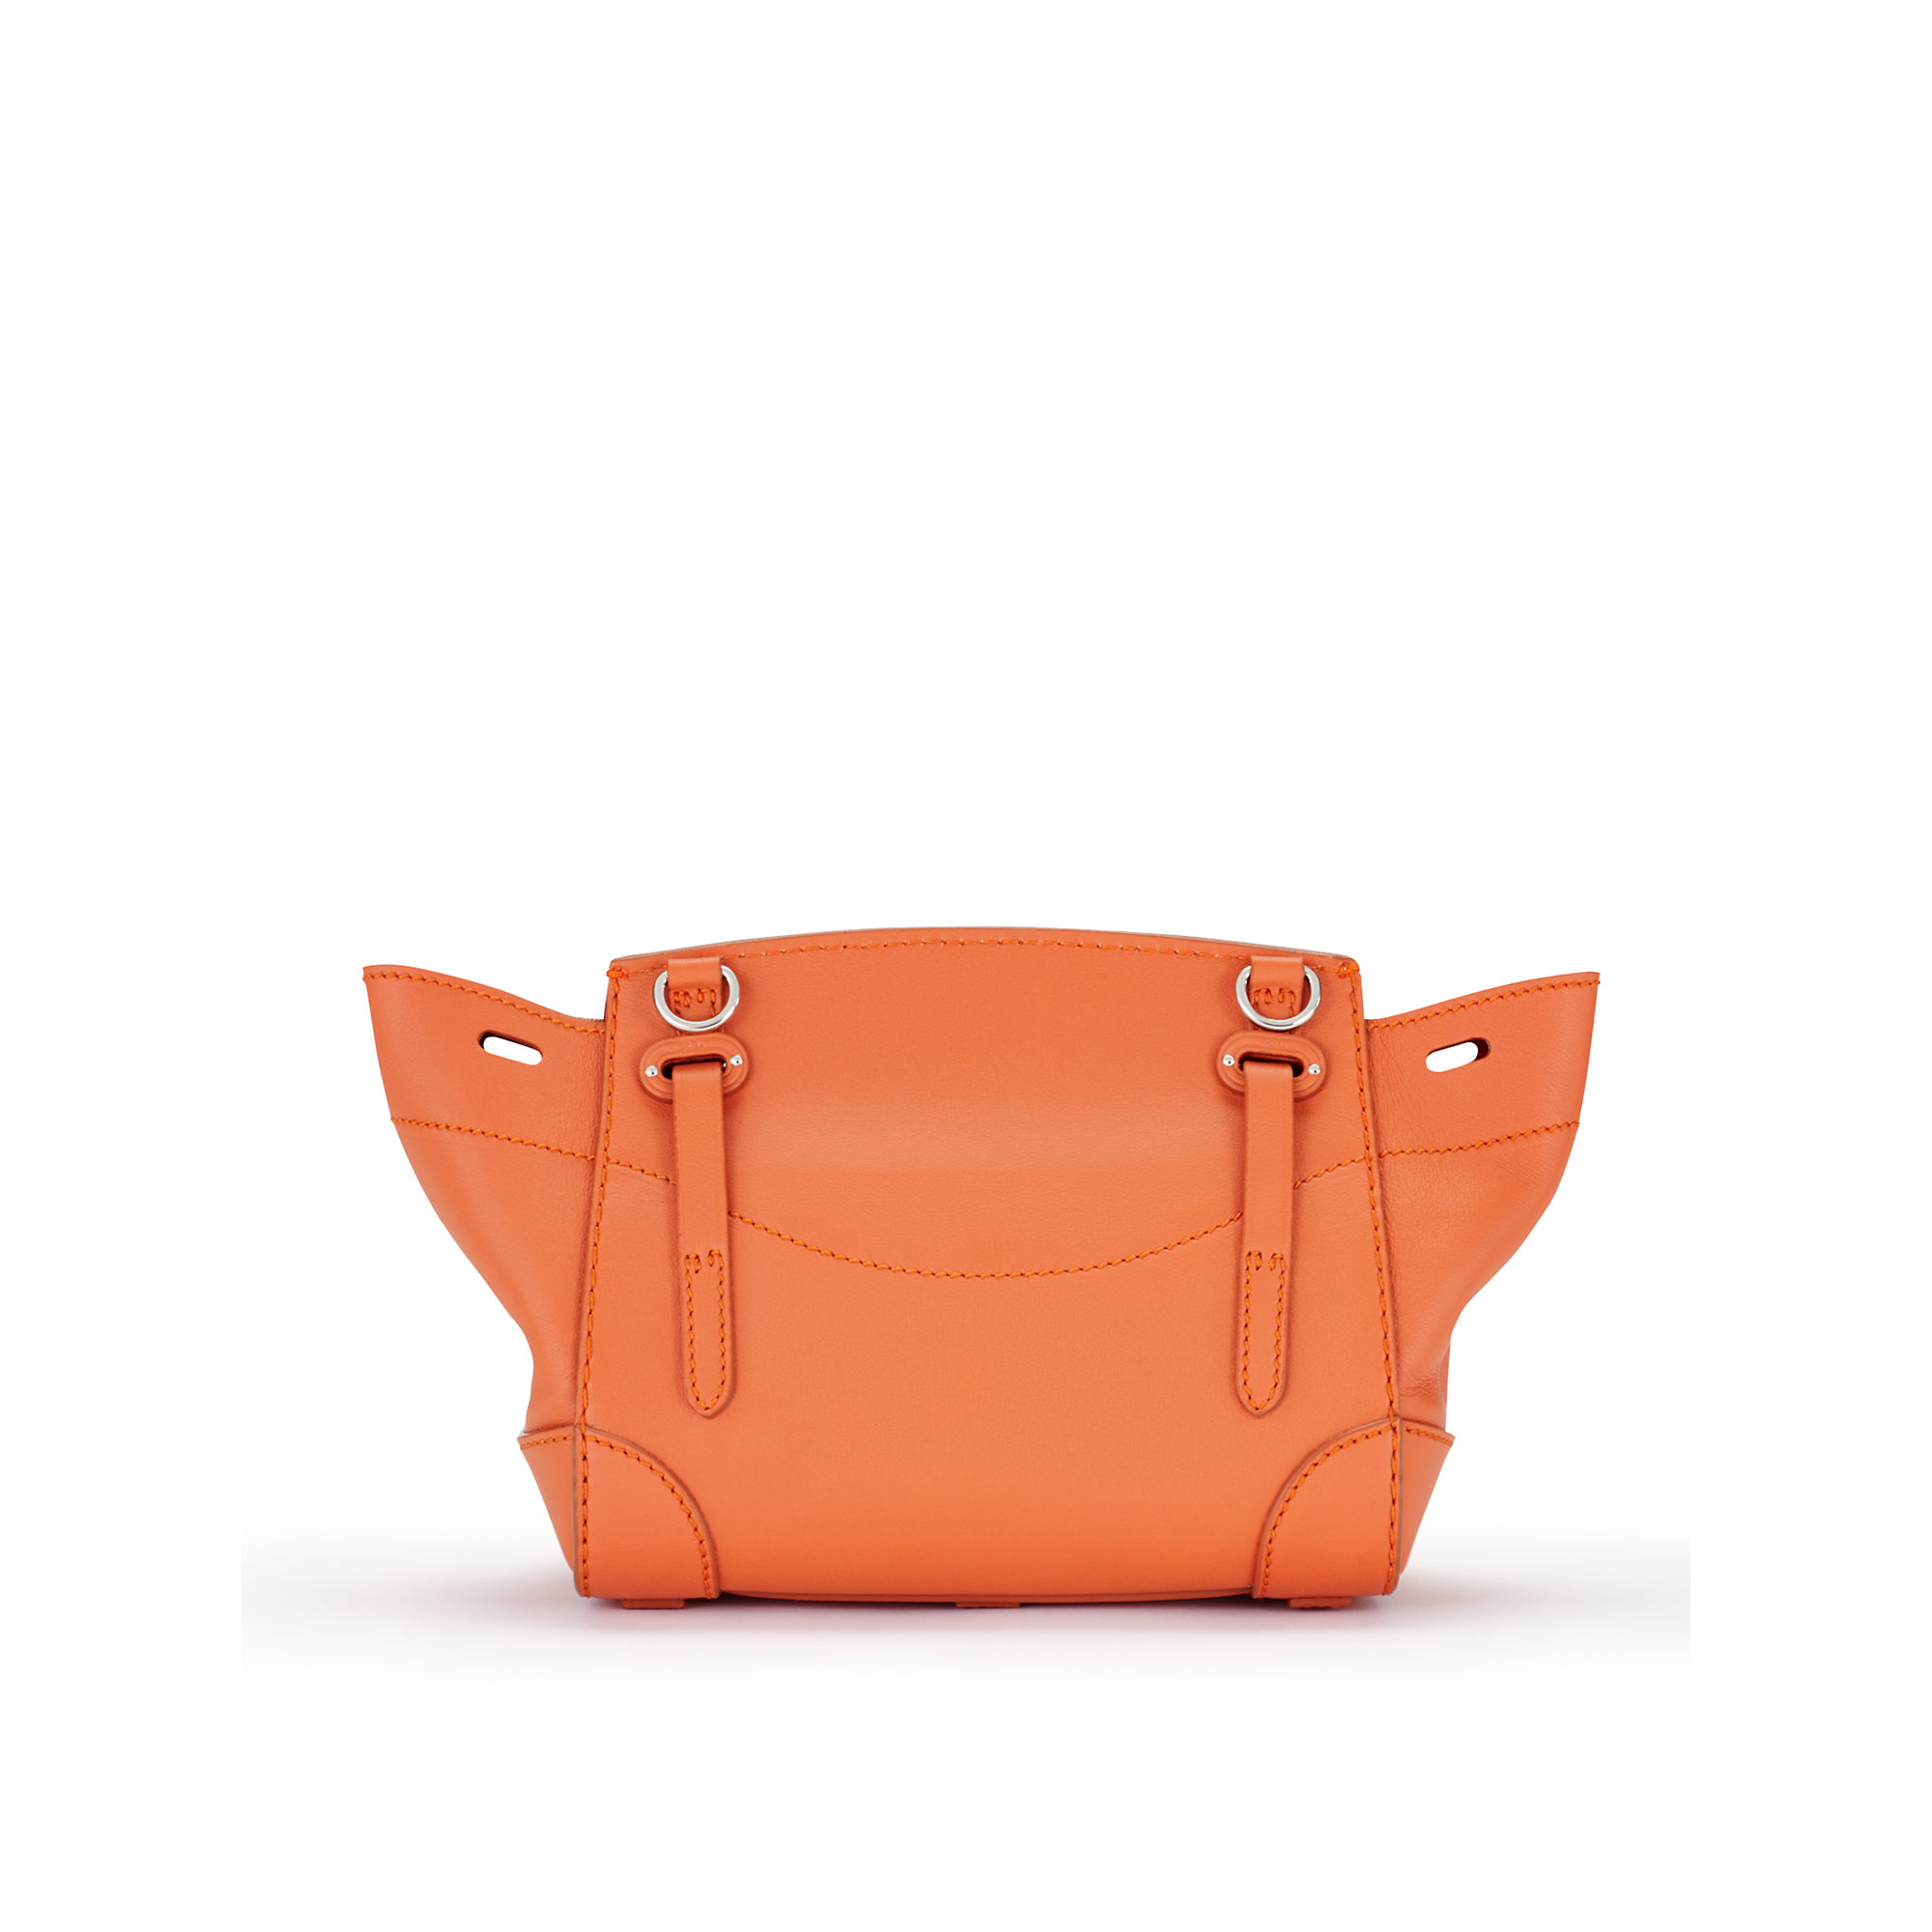 5a3dbfe8a8 Lyst - Pink Pony The Mini Ricky Cross-body in Orange